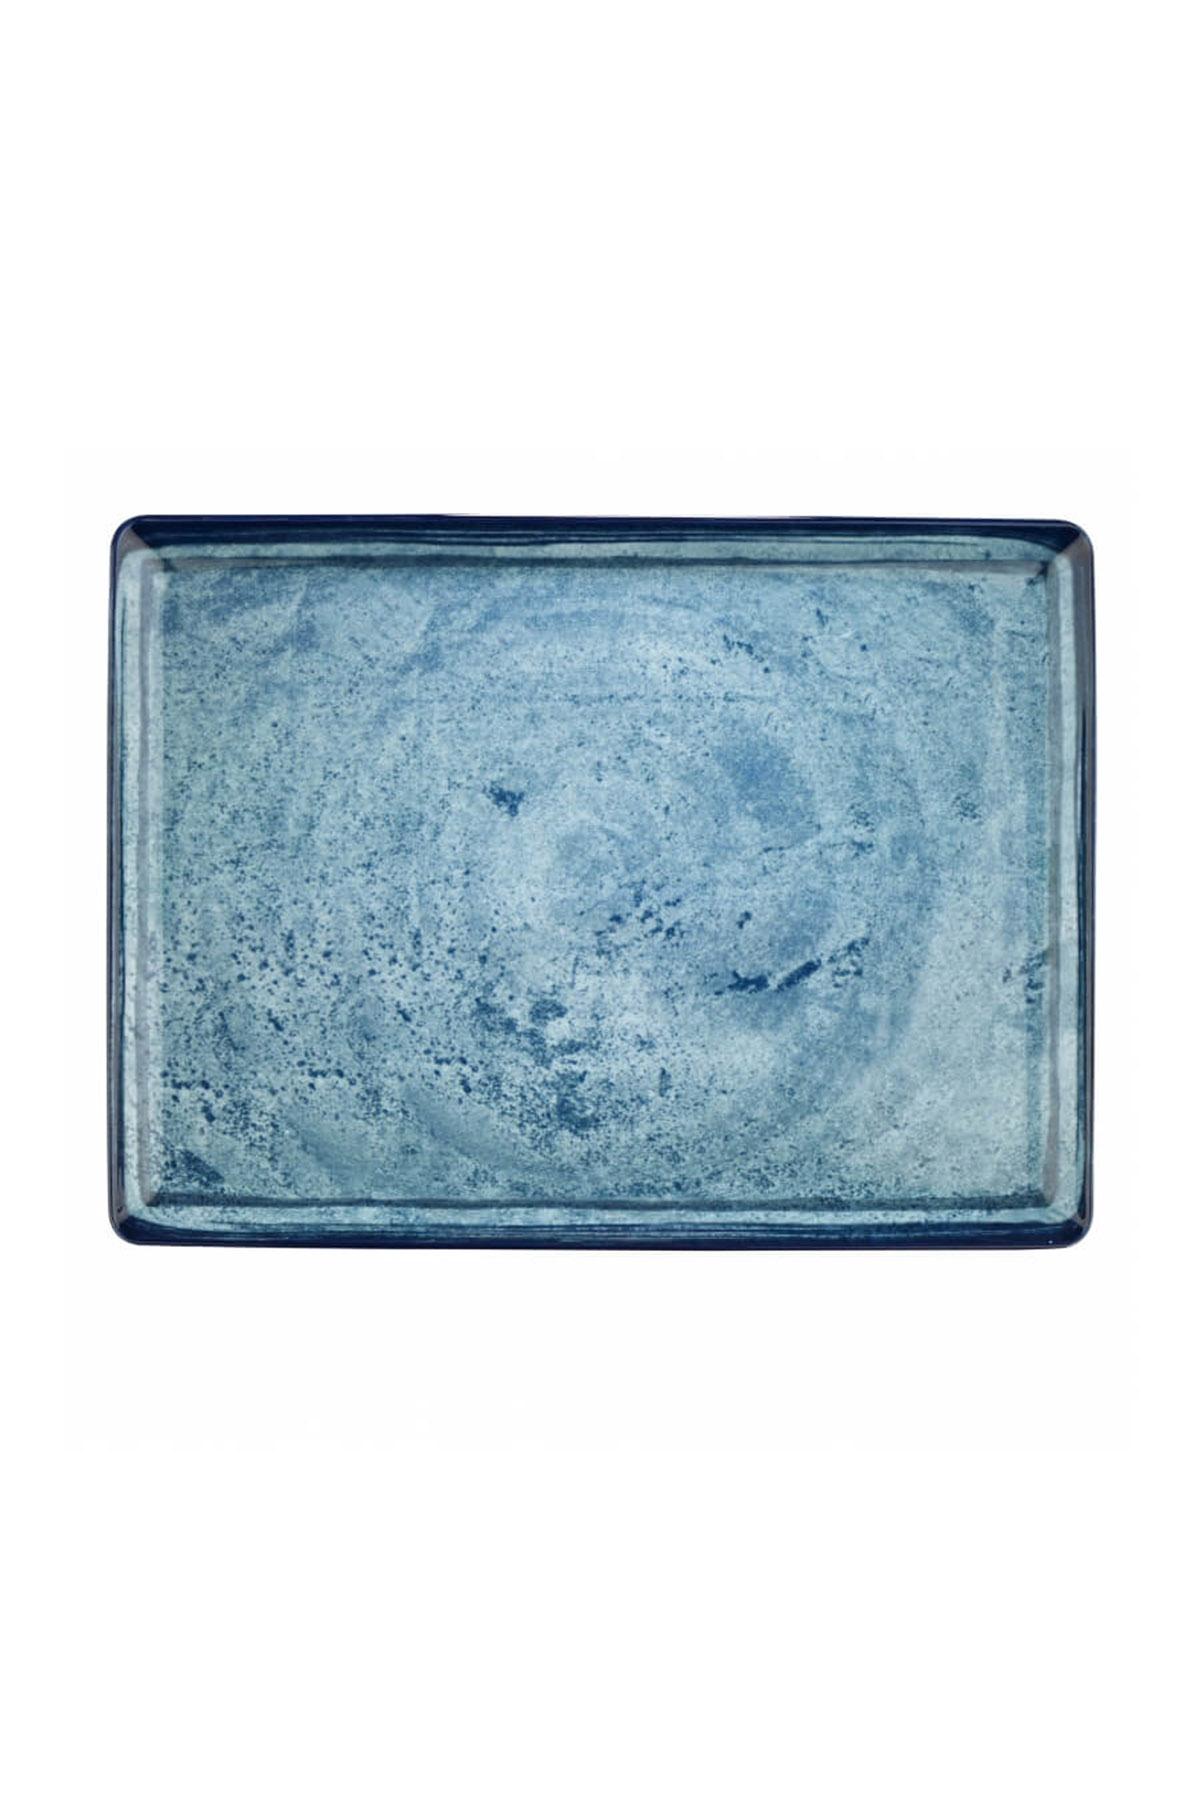 Kütahya Porselen Nanokrem 35x26 cm Düz Tabak 890003